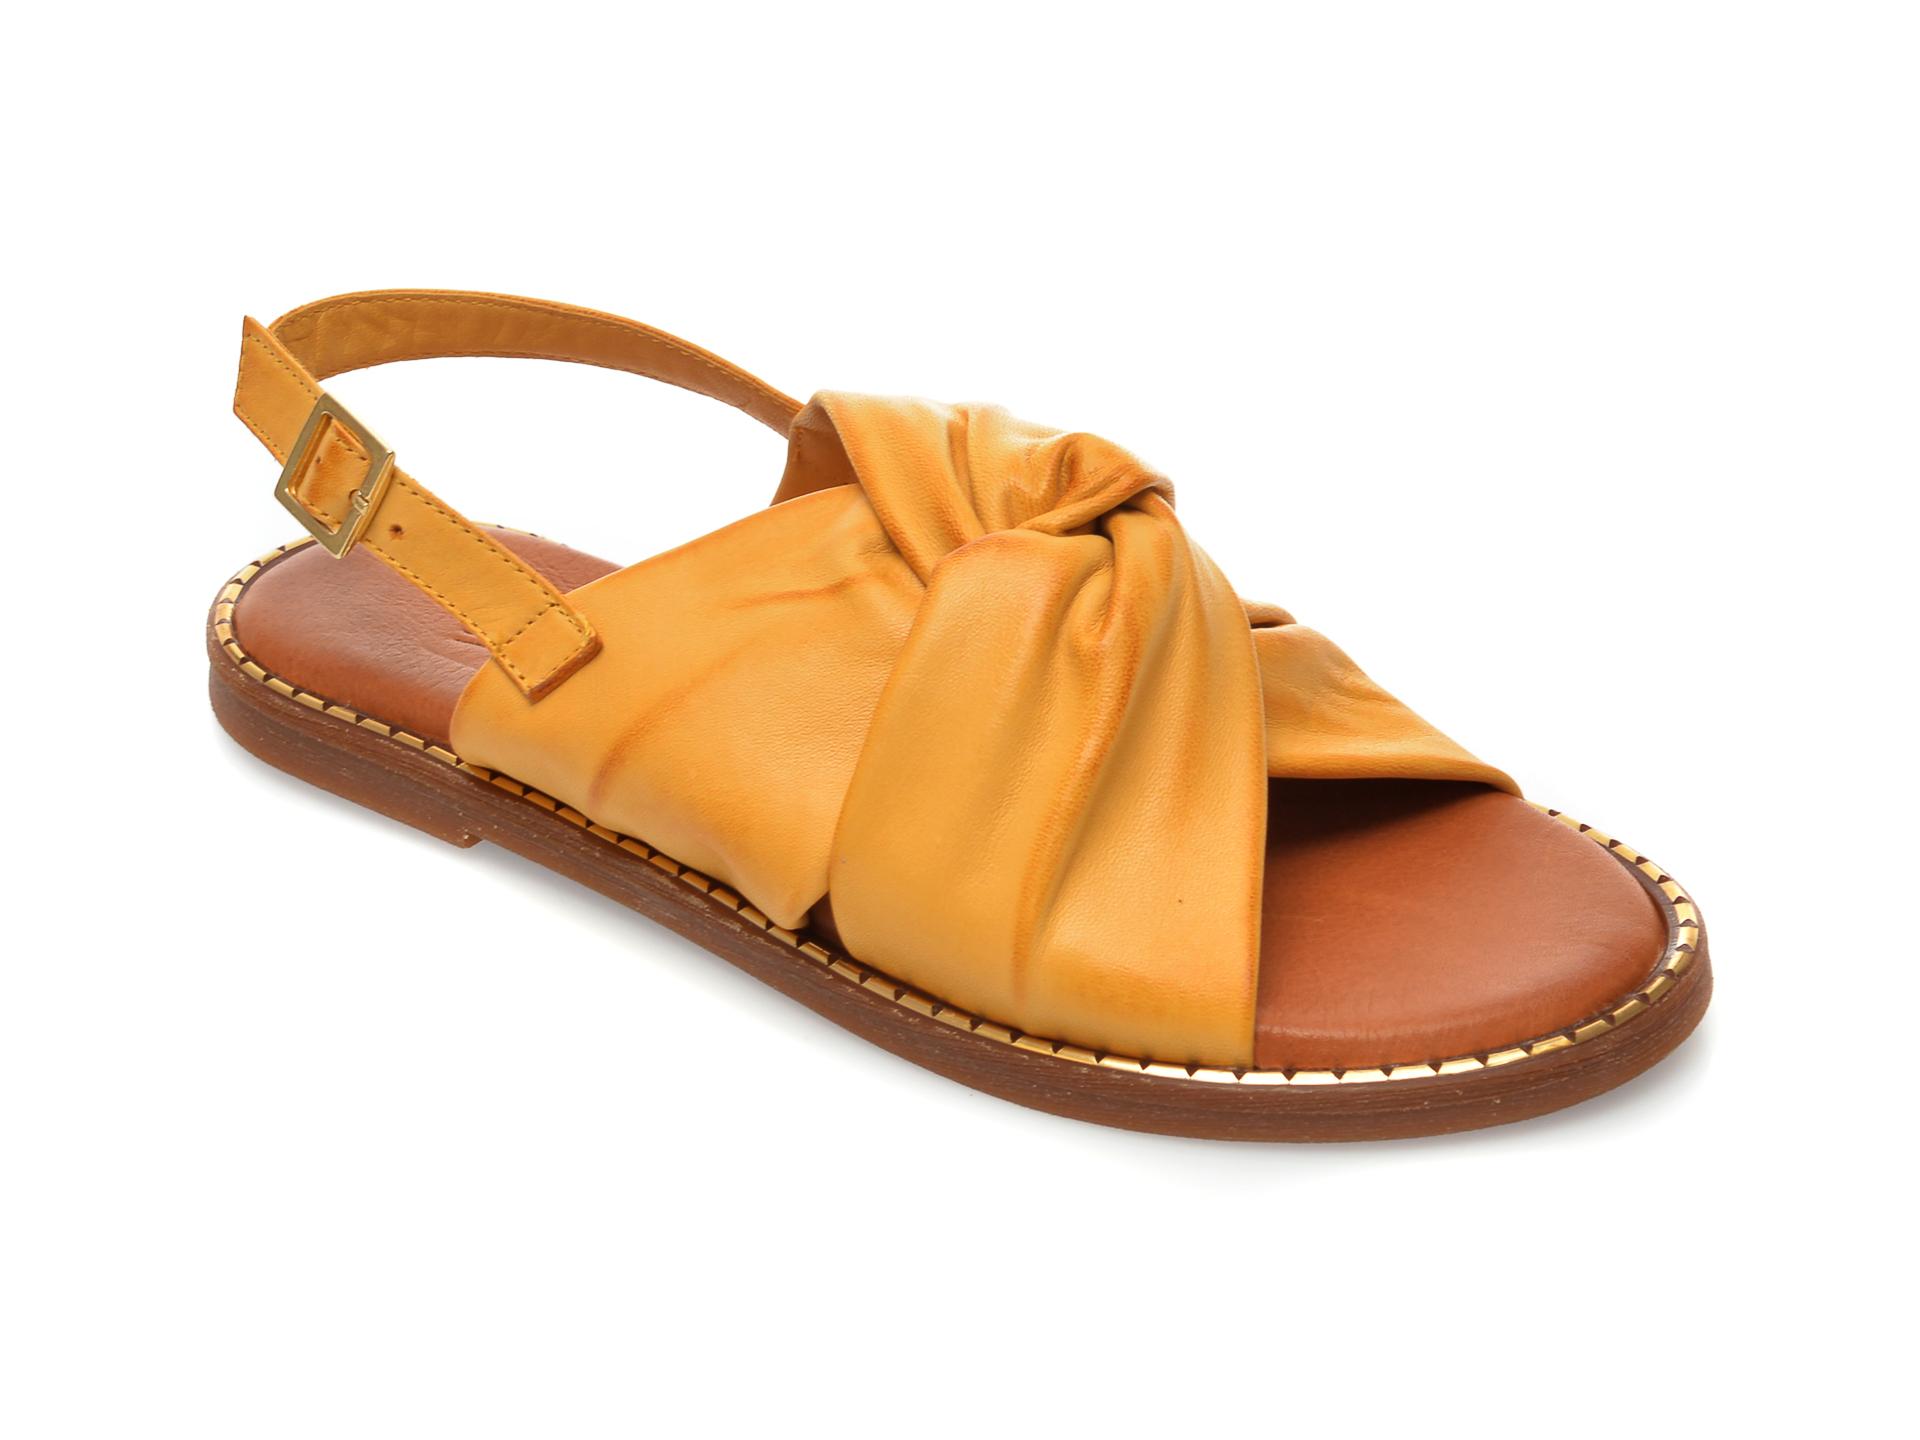 Sandale IMAGE galbene, 719, din piele naturala imagine otter.ro